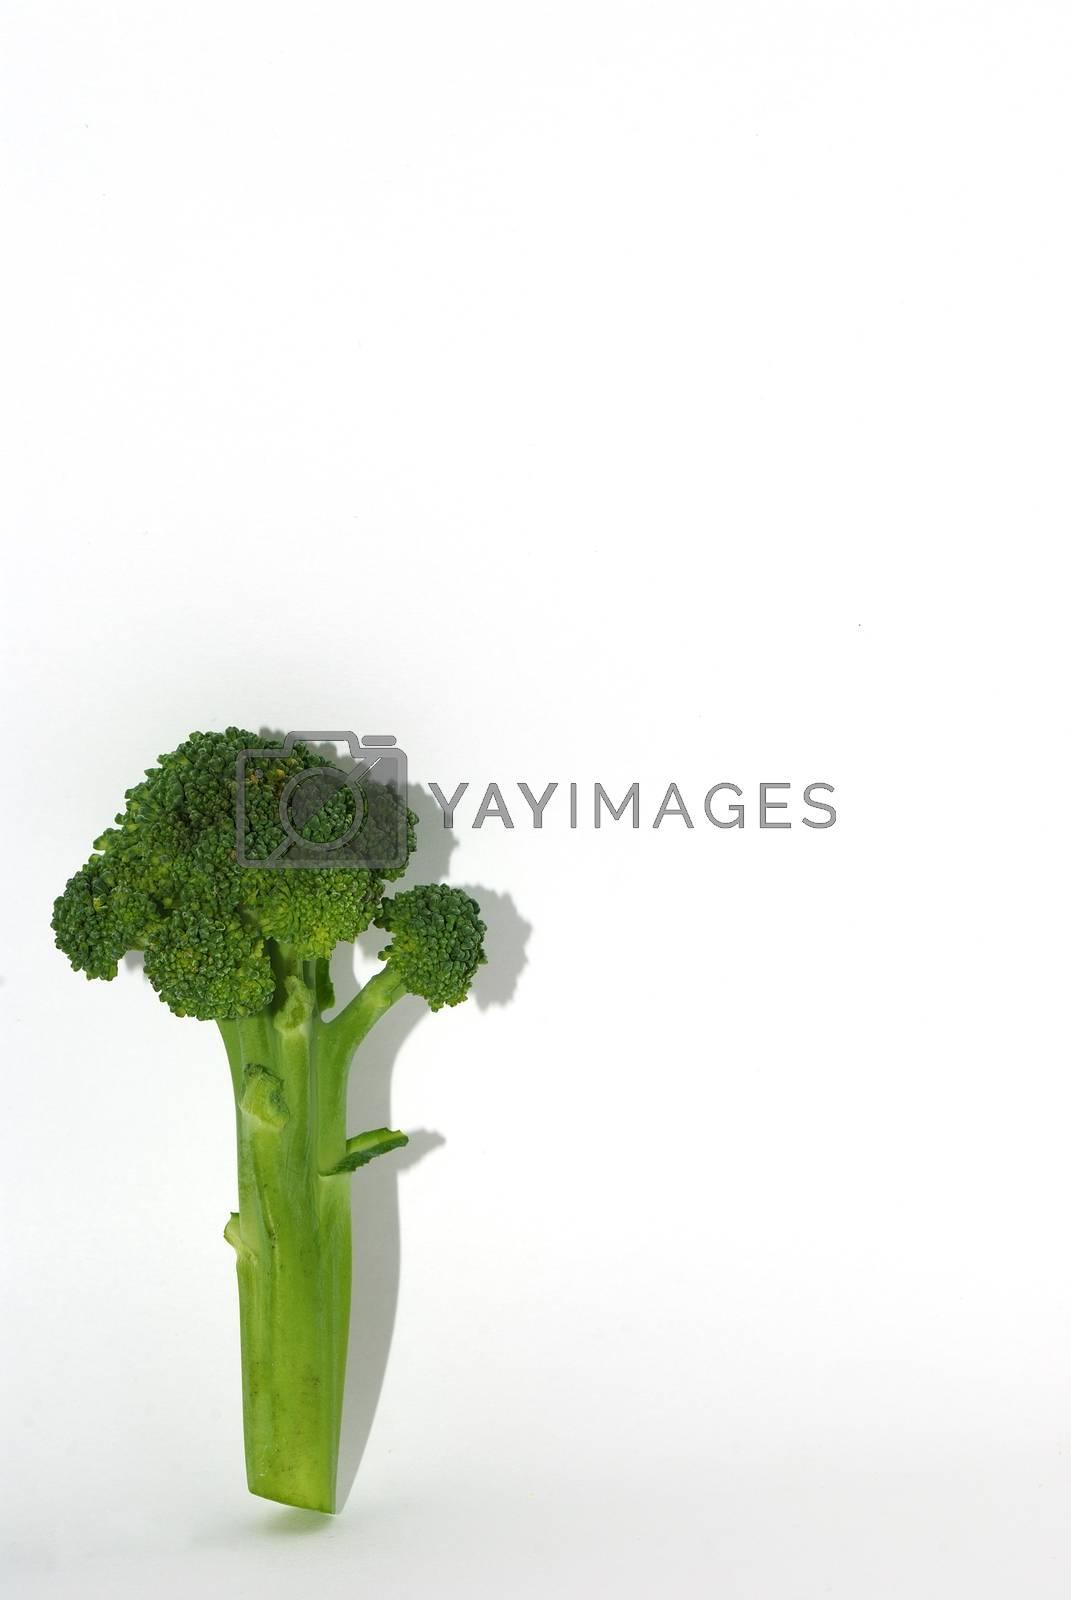 fresh green healthy vegetable brokoli portrait with shadow on white background